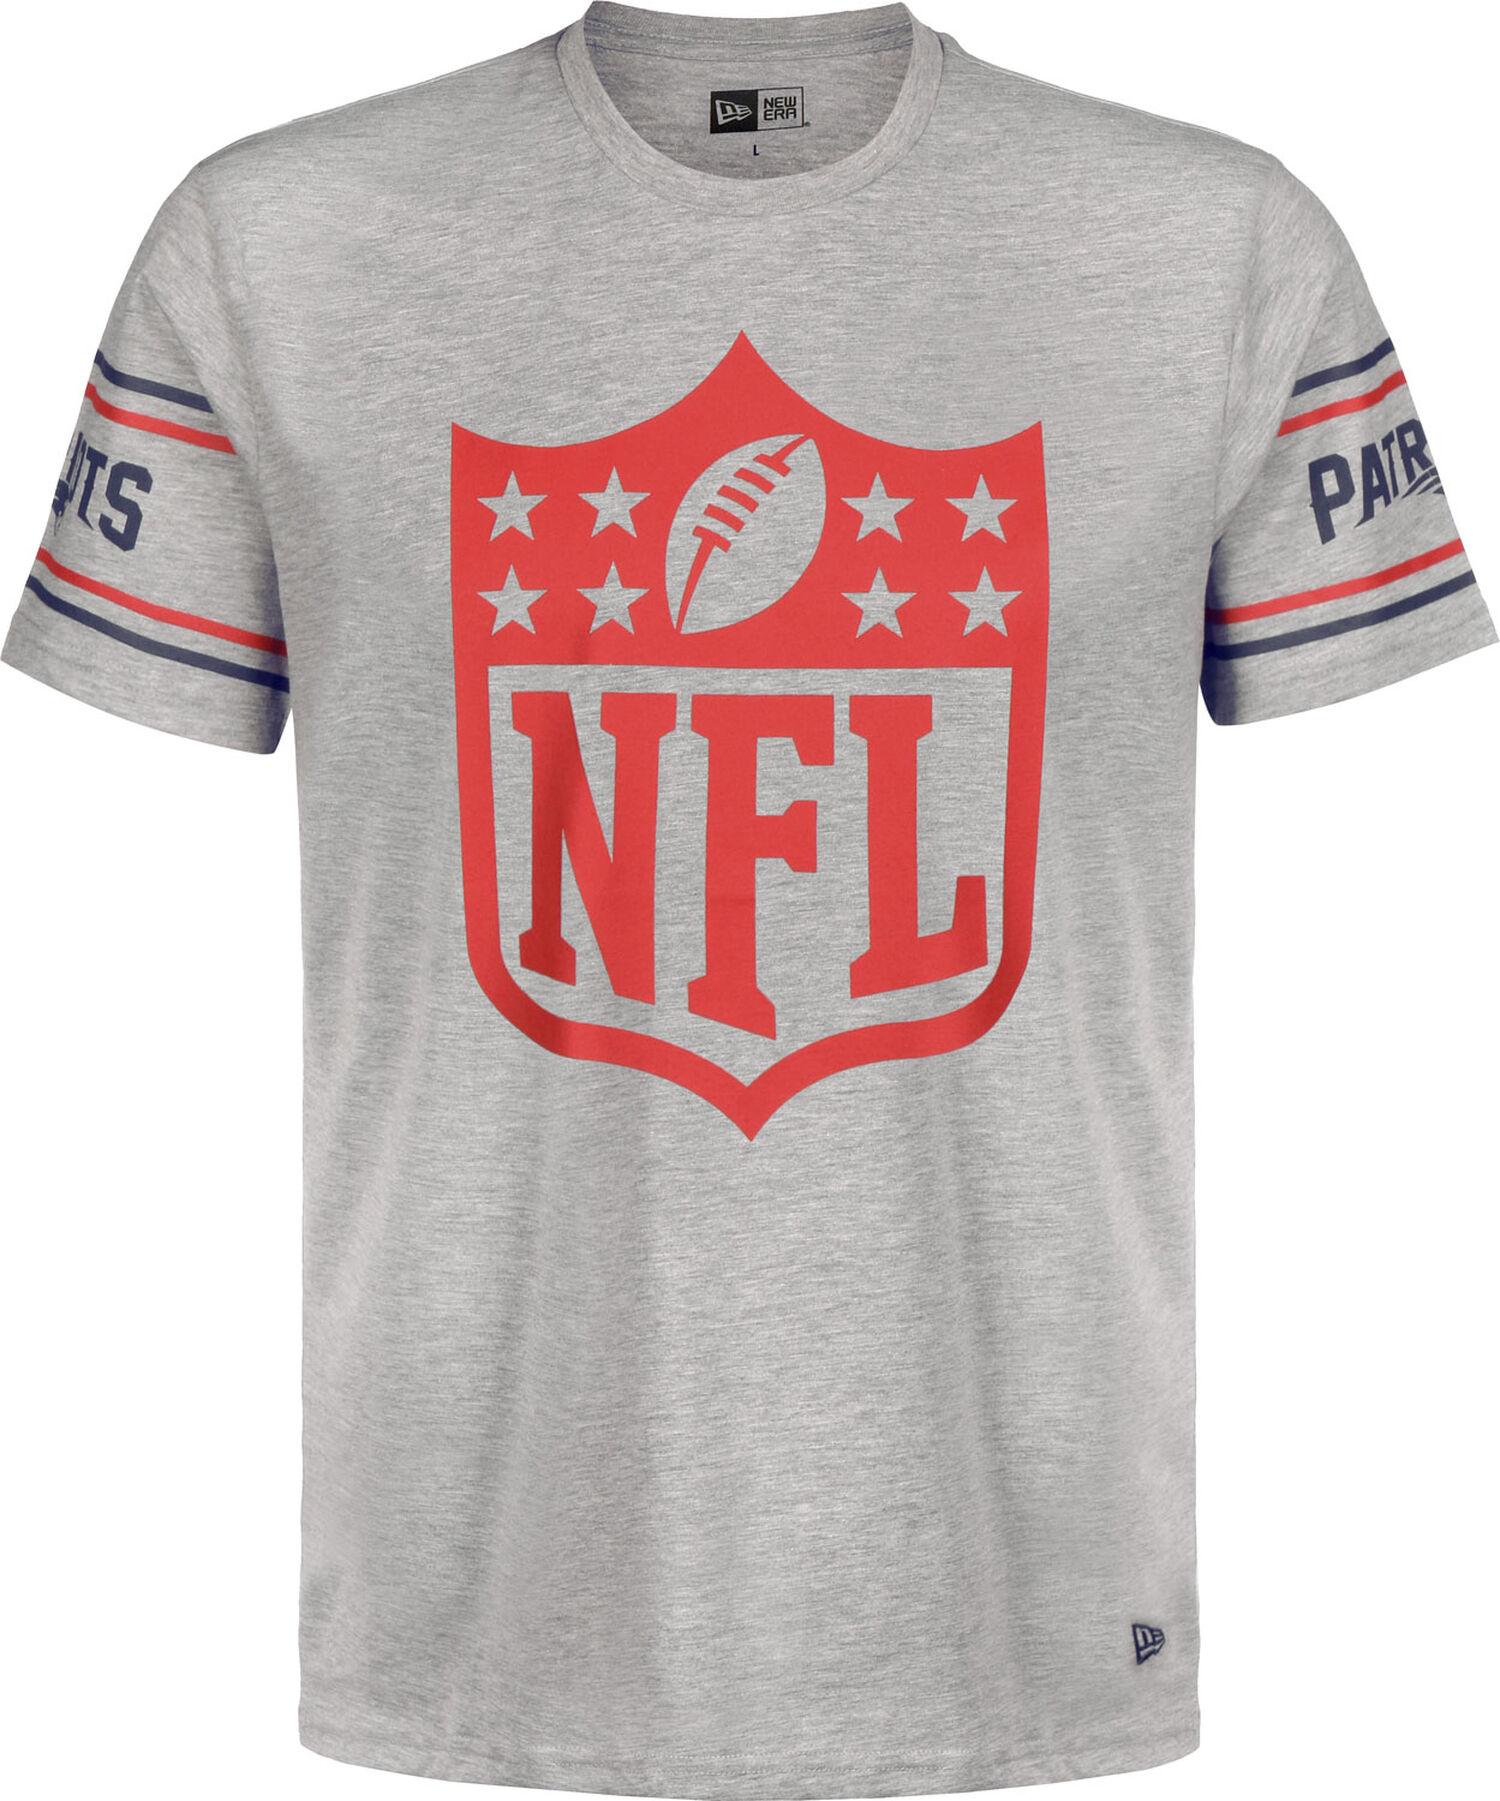 NFL Badge New England Patriots